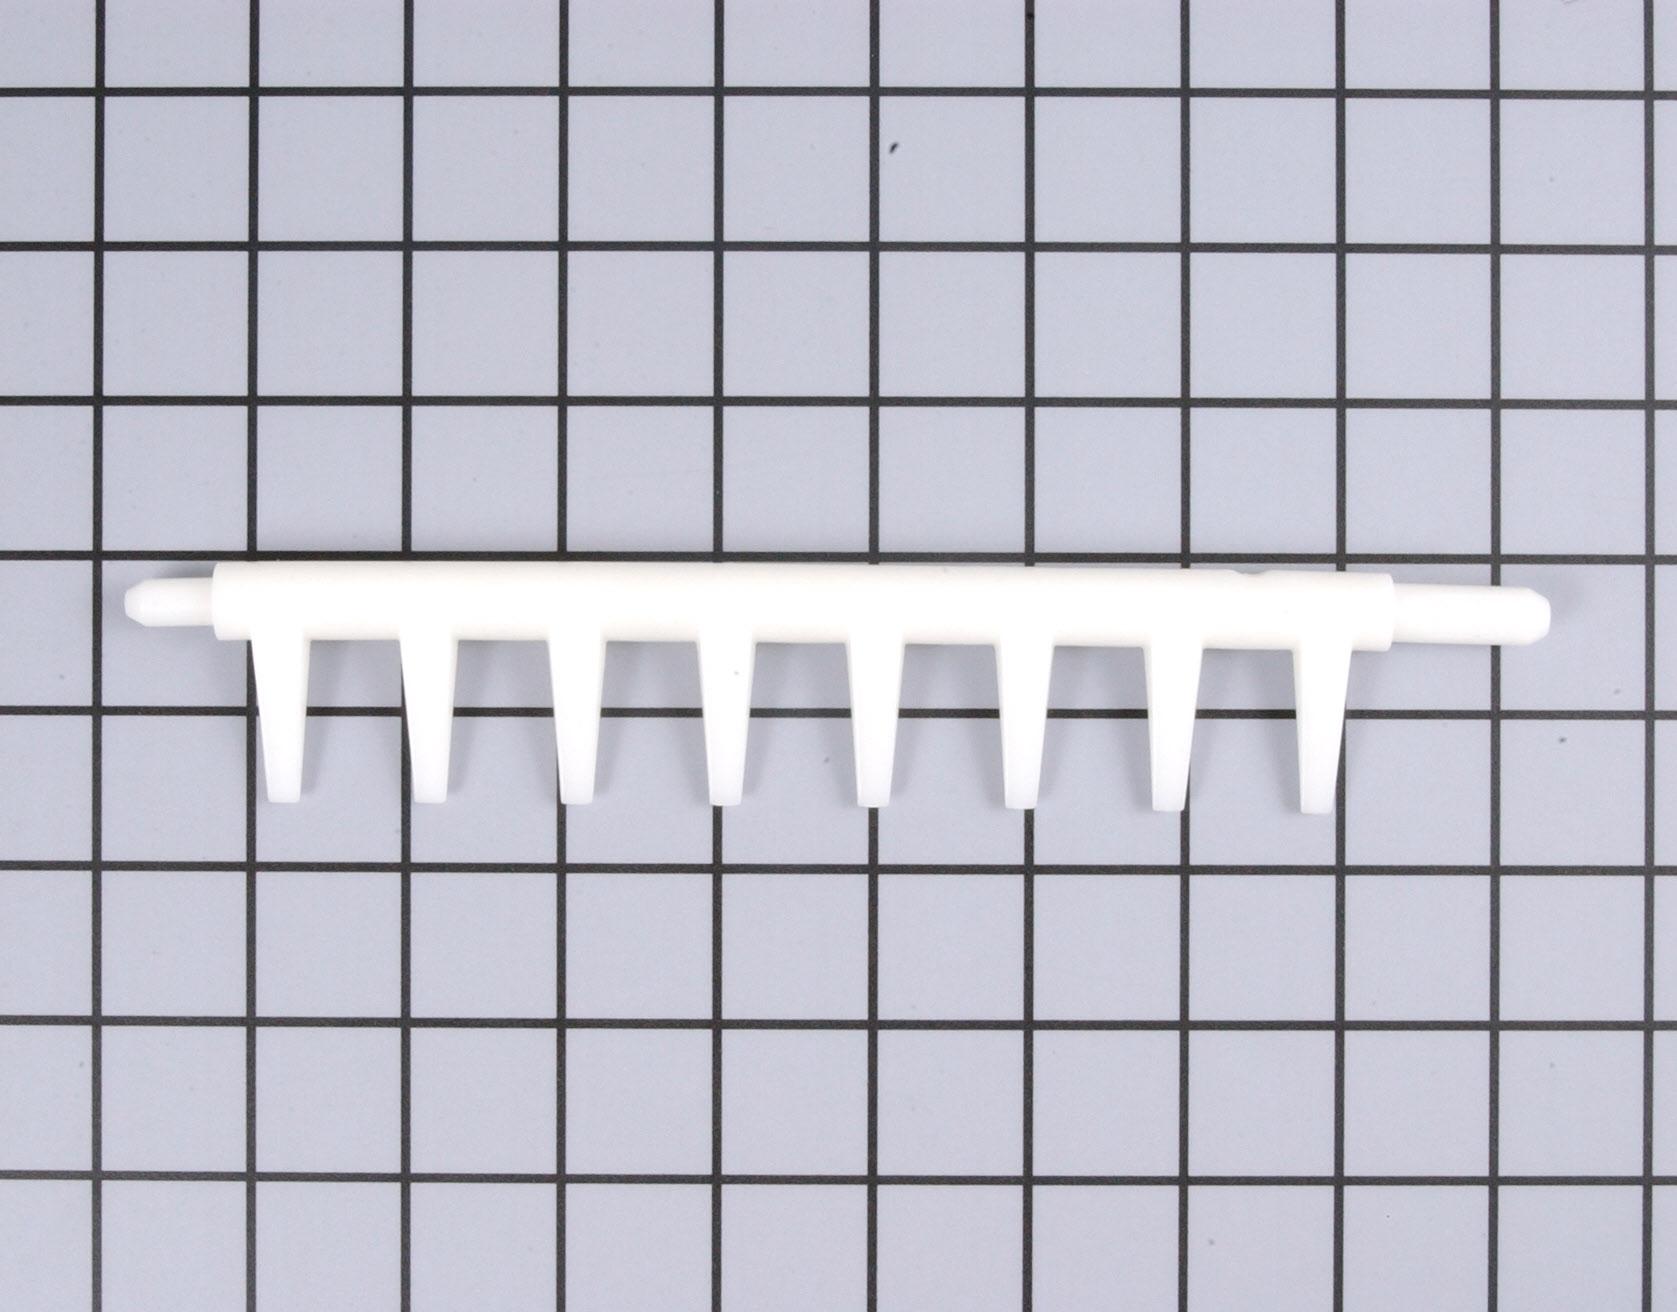 WP627843 Sharp Refrigerator Part -Ice Ejector Bar